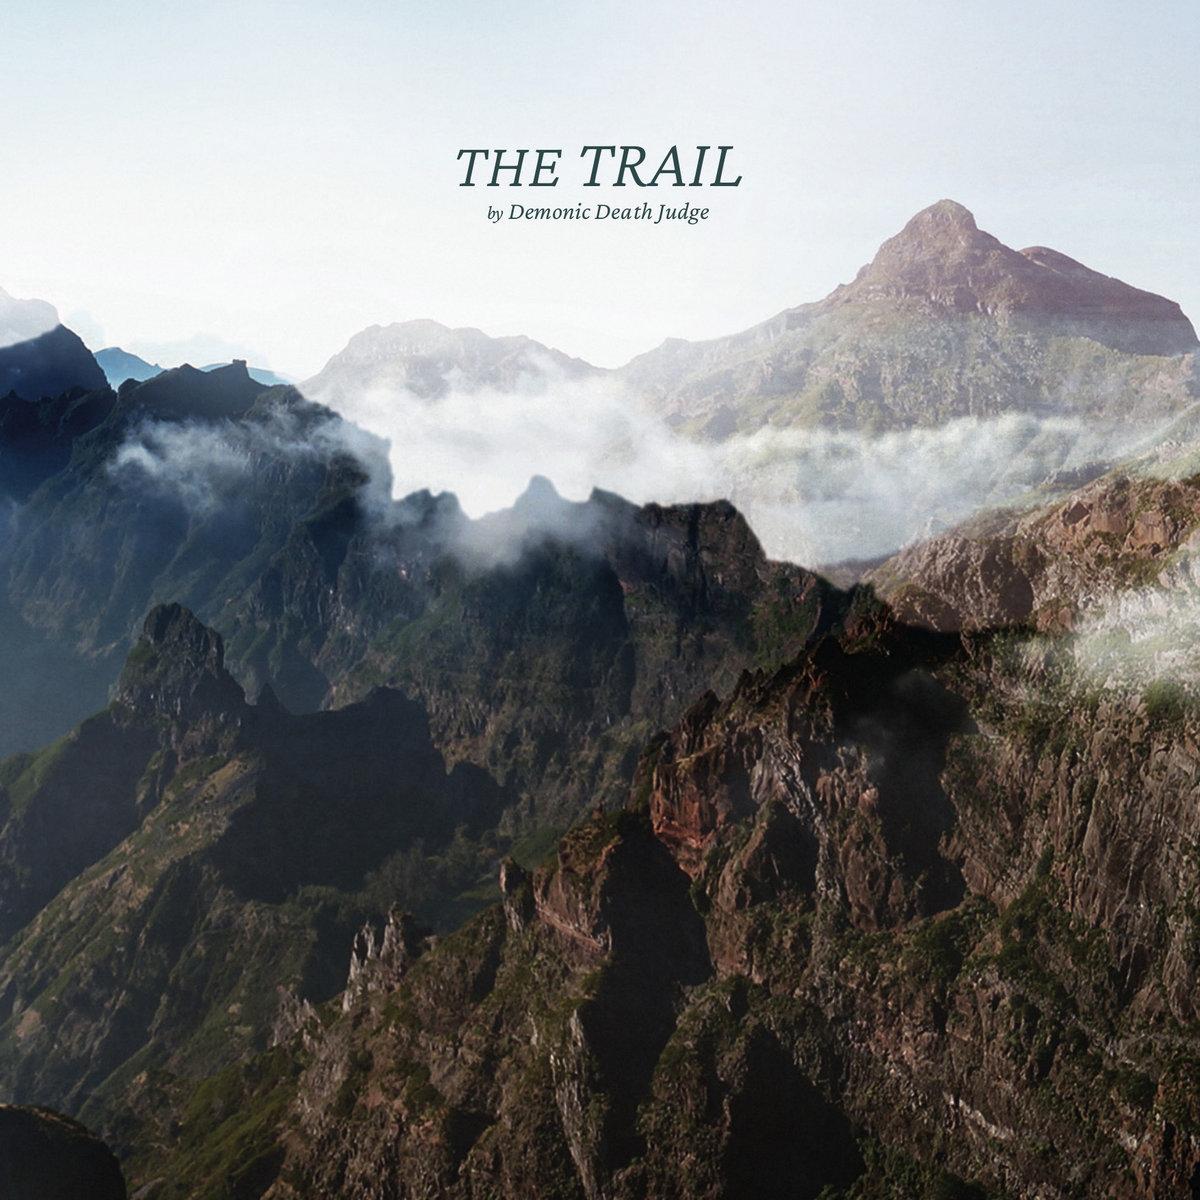 DEMONIC DEATH JUDGE – The Trail